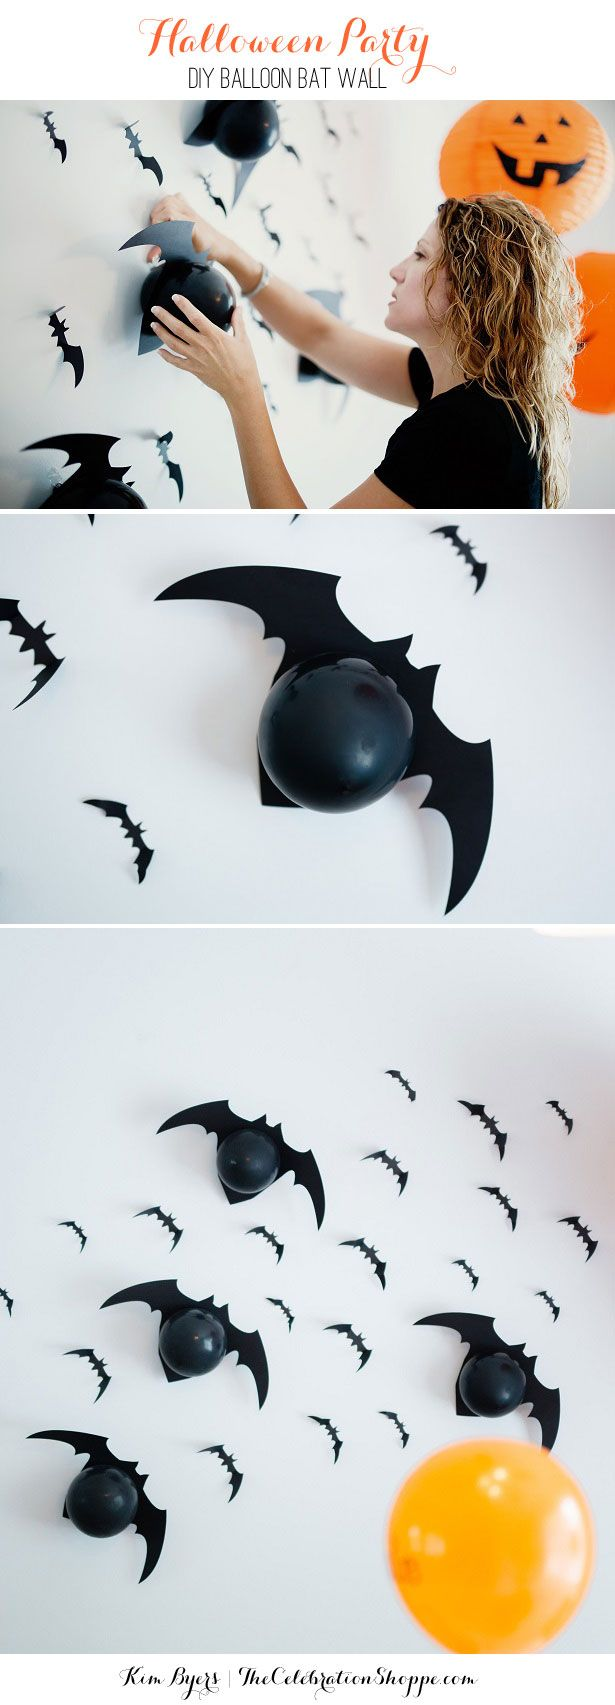 Consigue aquí las palantillas para decorar tus globos con alas de murciélagos!! TheCelebrationShoppe.com